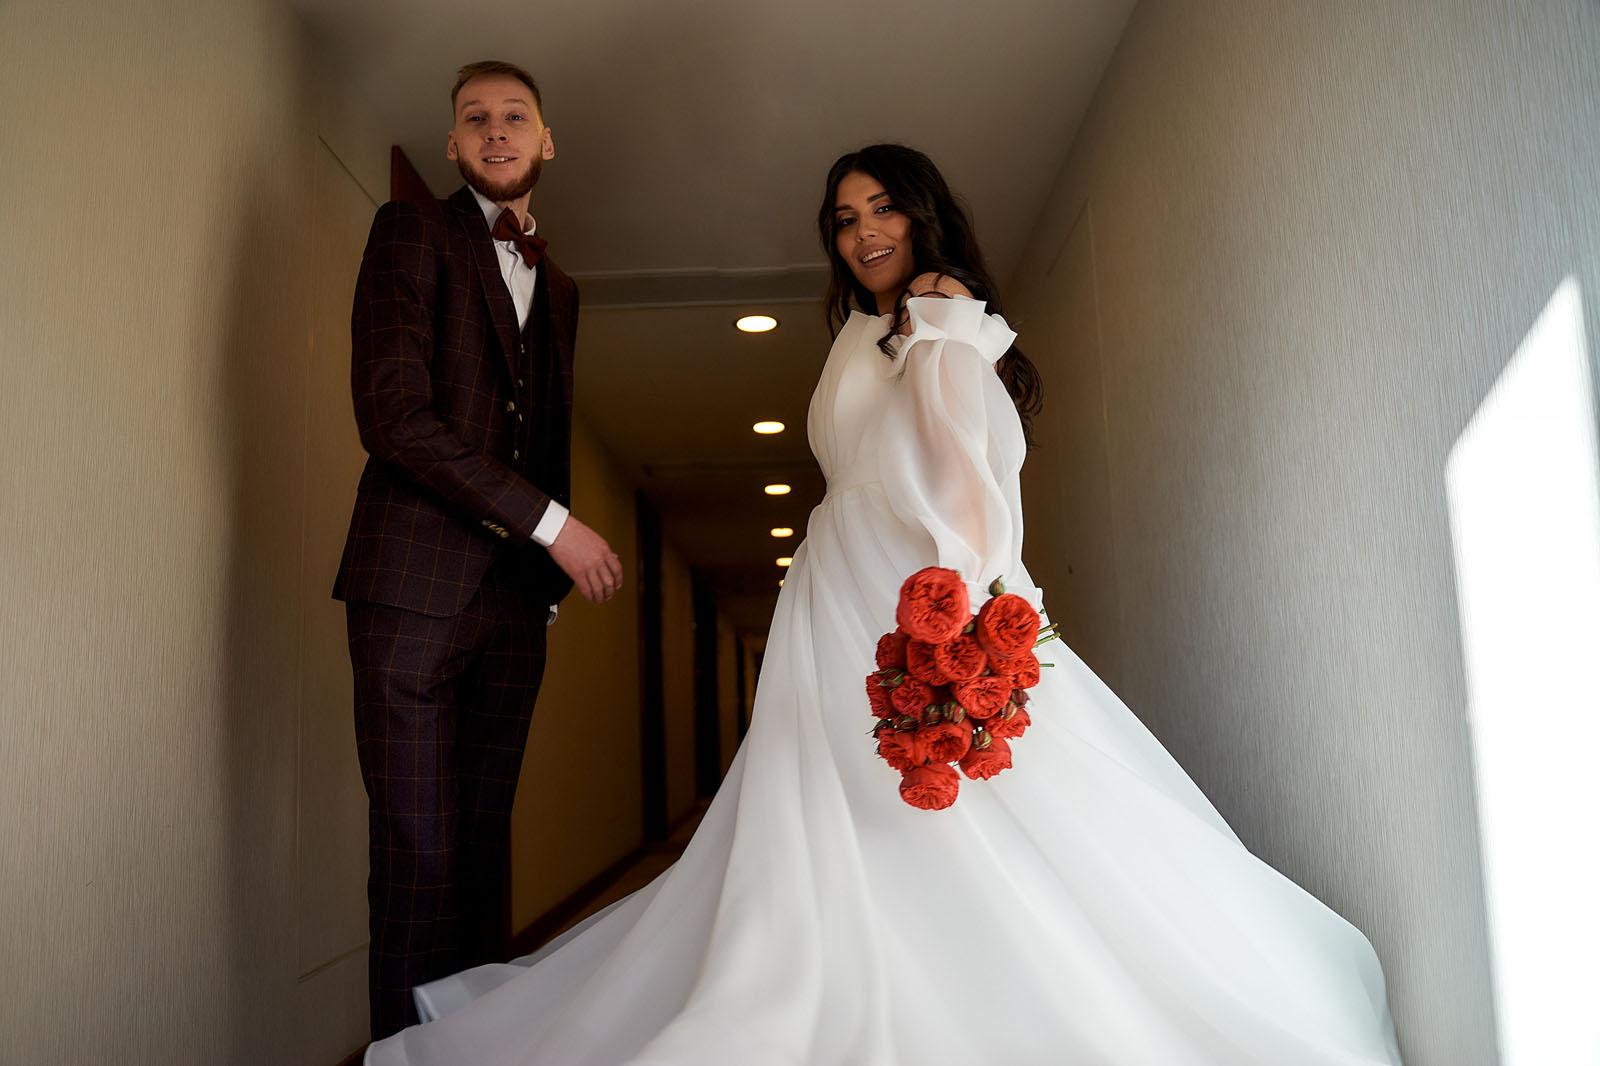 wedding@bekarev2021-04-10-09-22-11_1.jpg